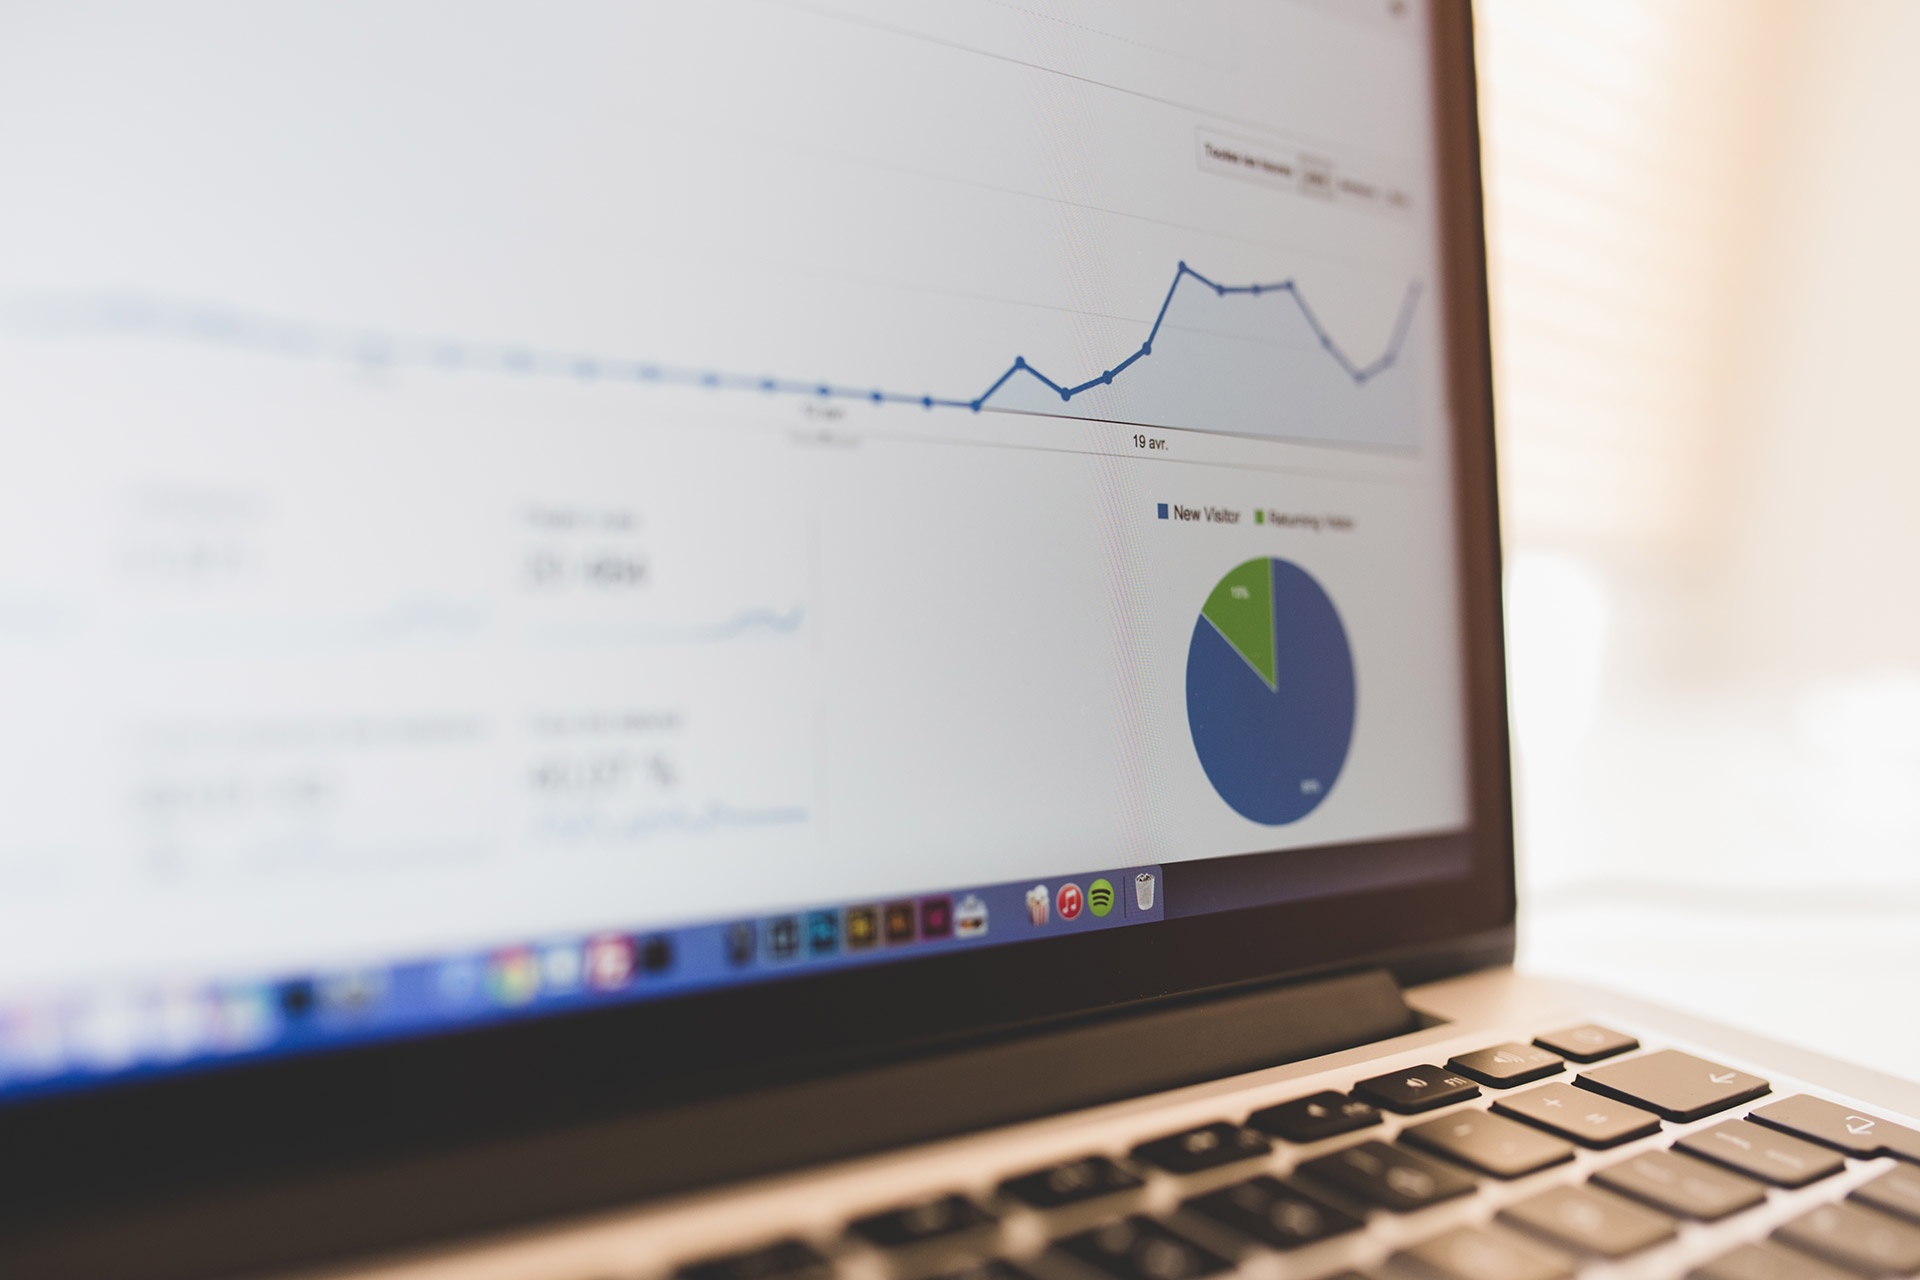 onefourzero platform analysis image depicting digital analytics